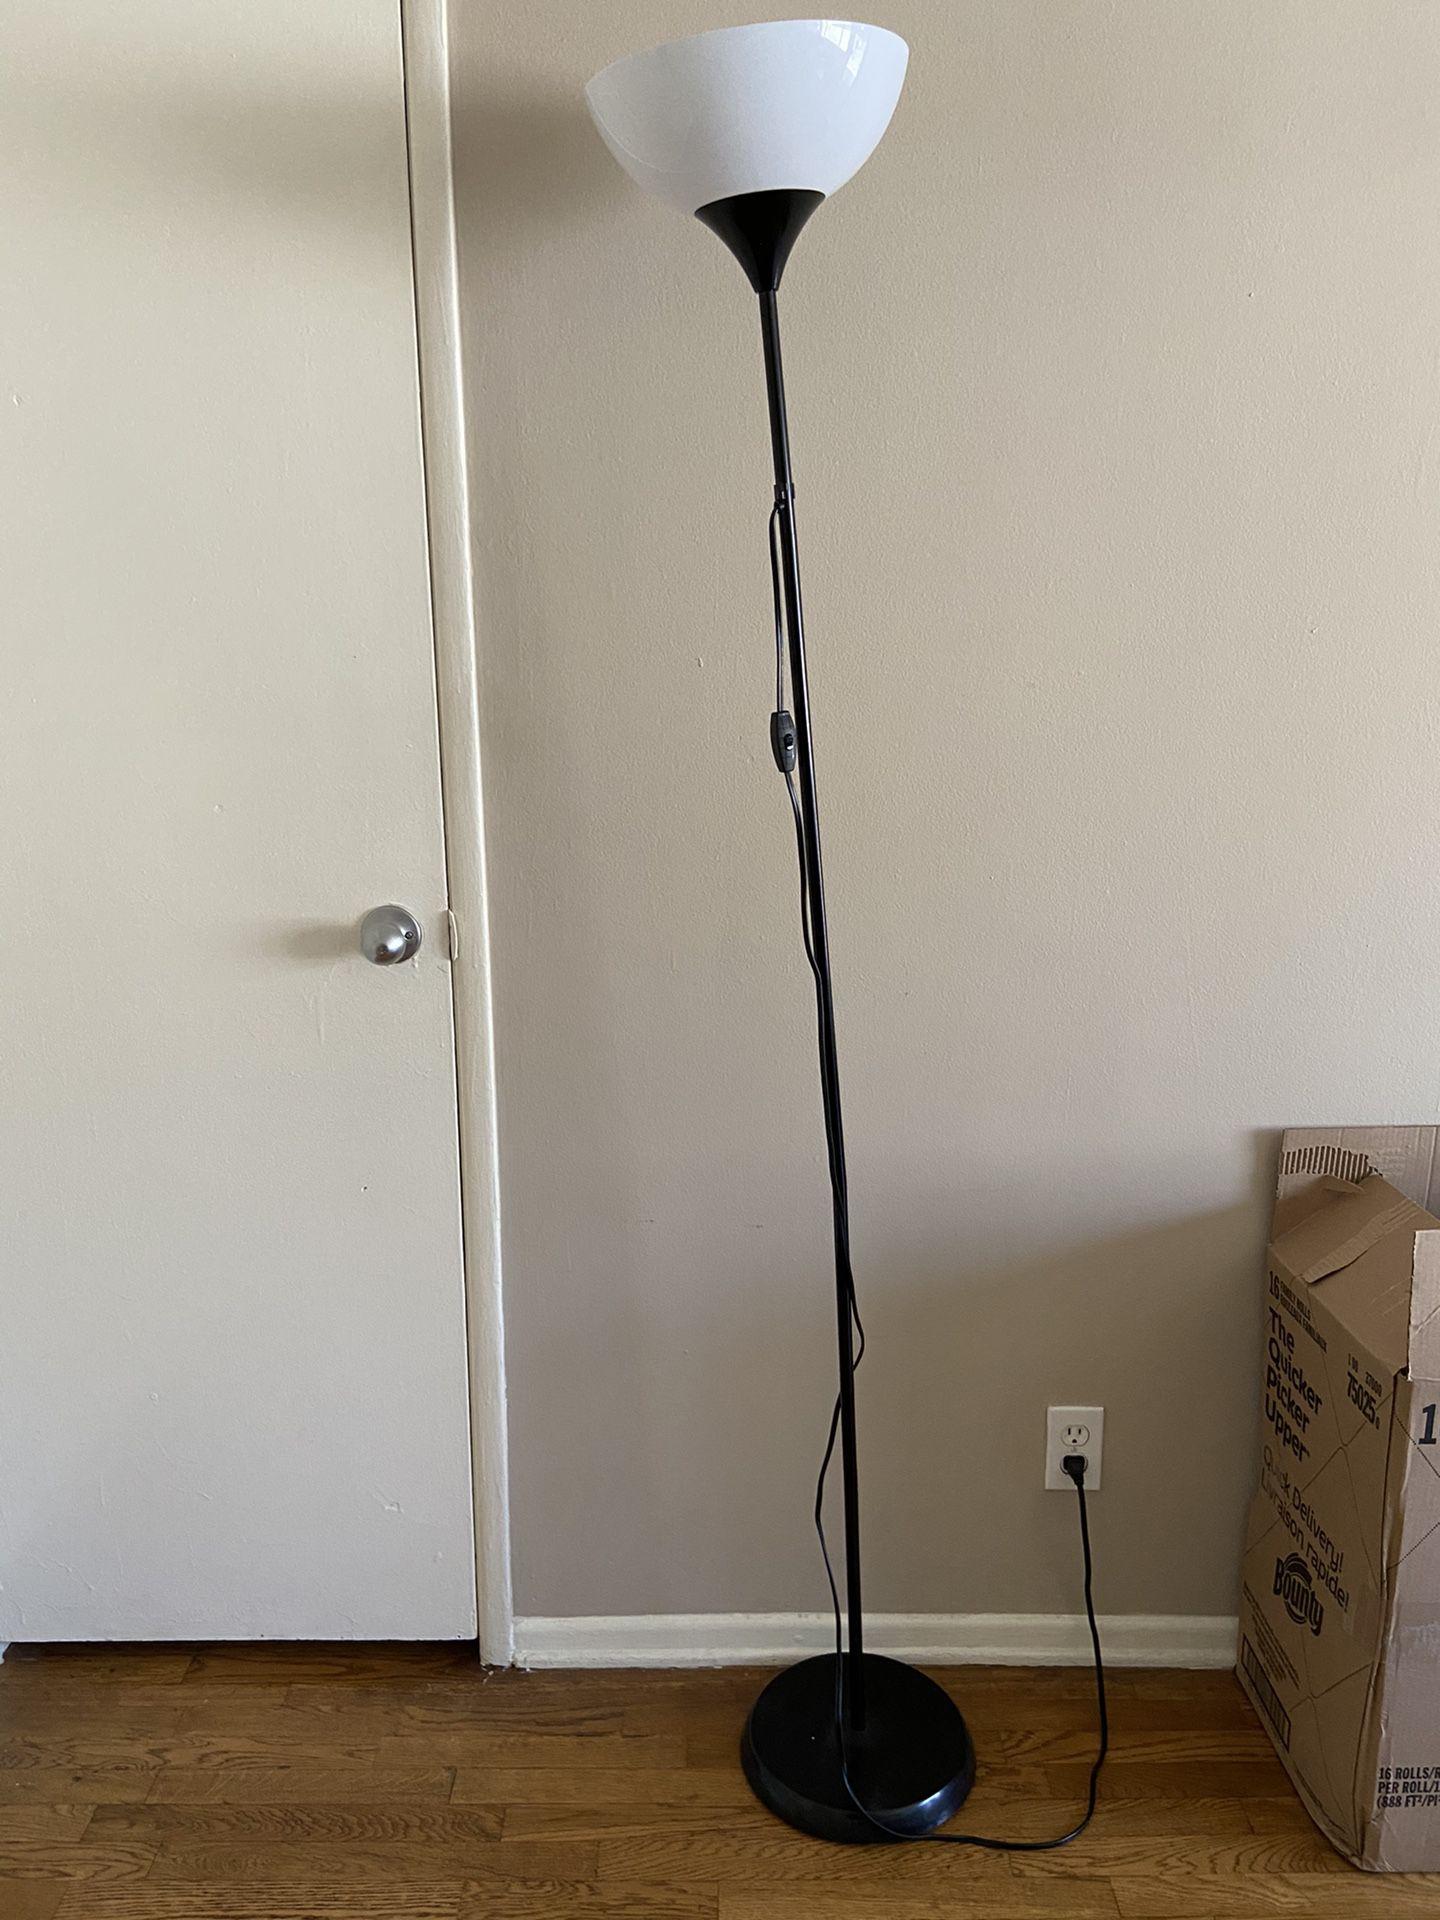 Ikea Not floor lamp with Bulb